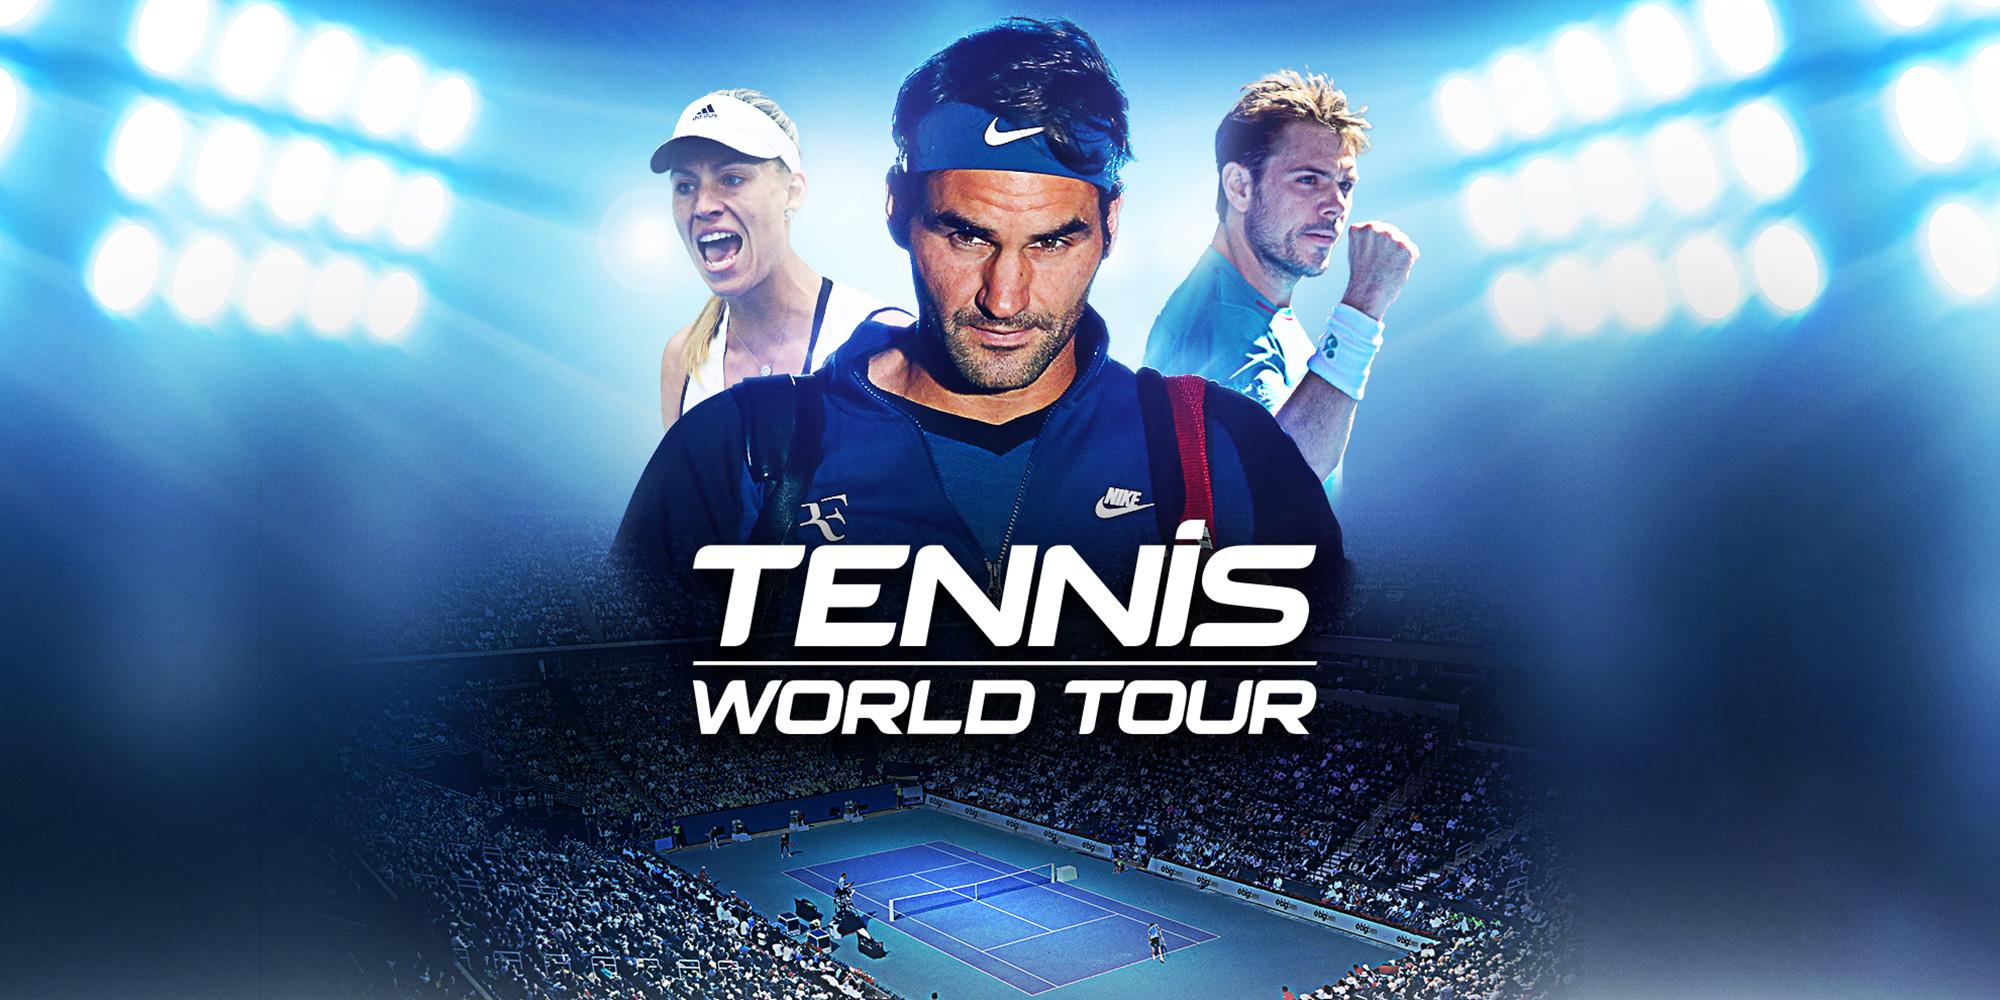 Tennis World Tour.jpg